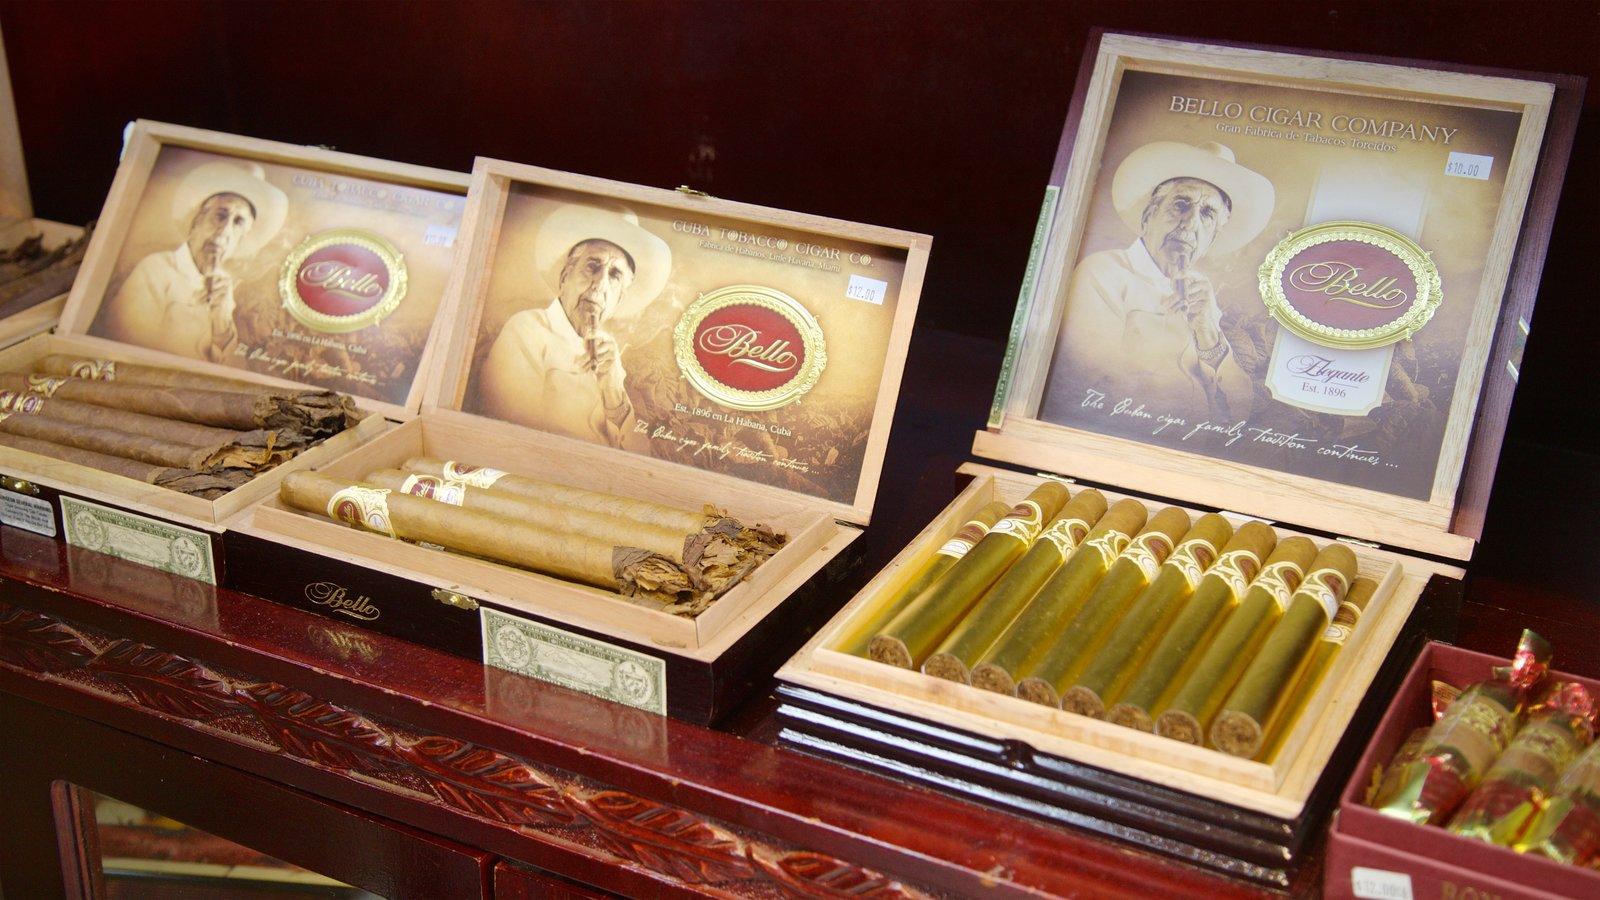 Cuba Tobacco Cigar Co featuring shopping